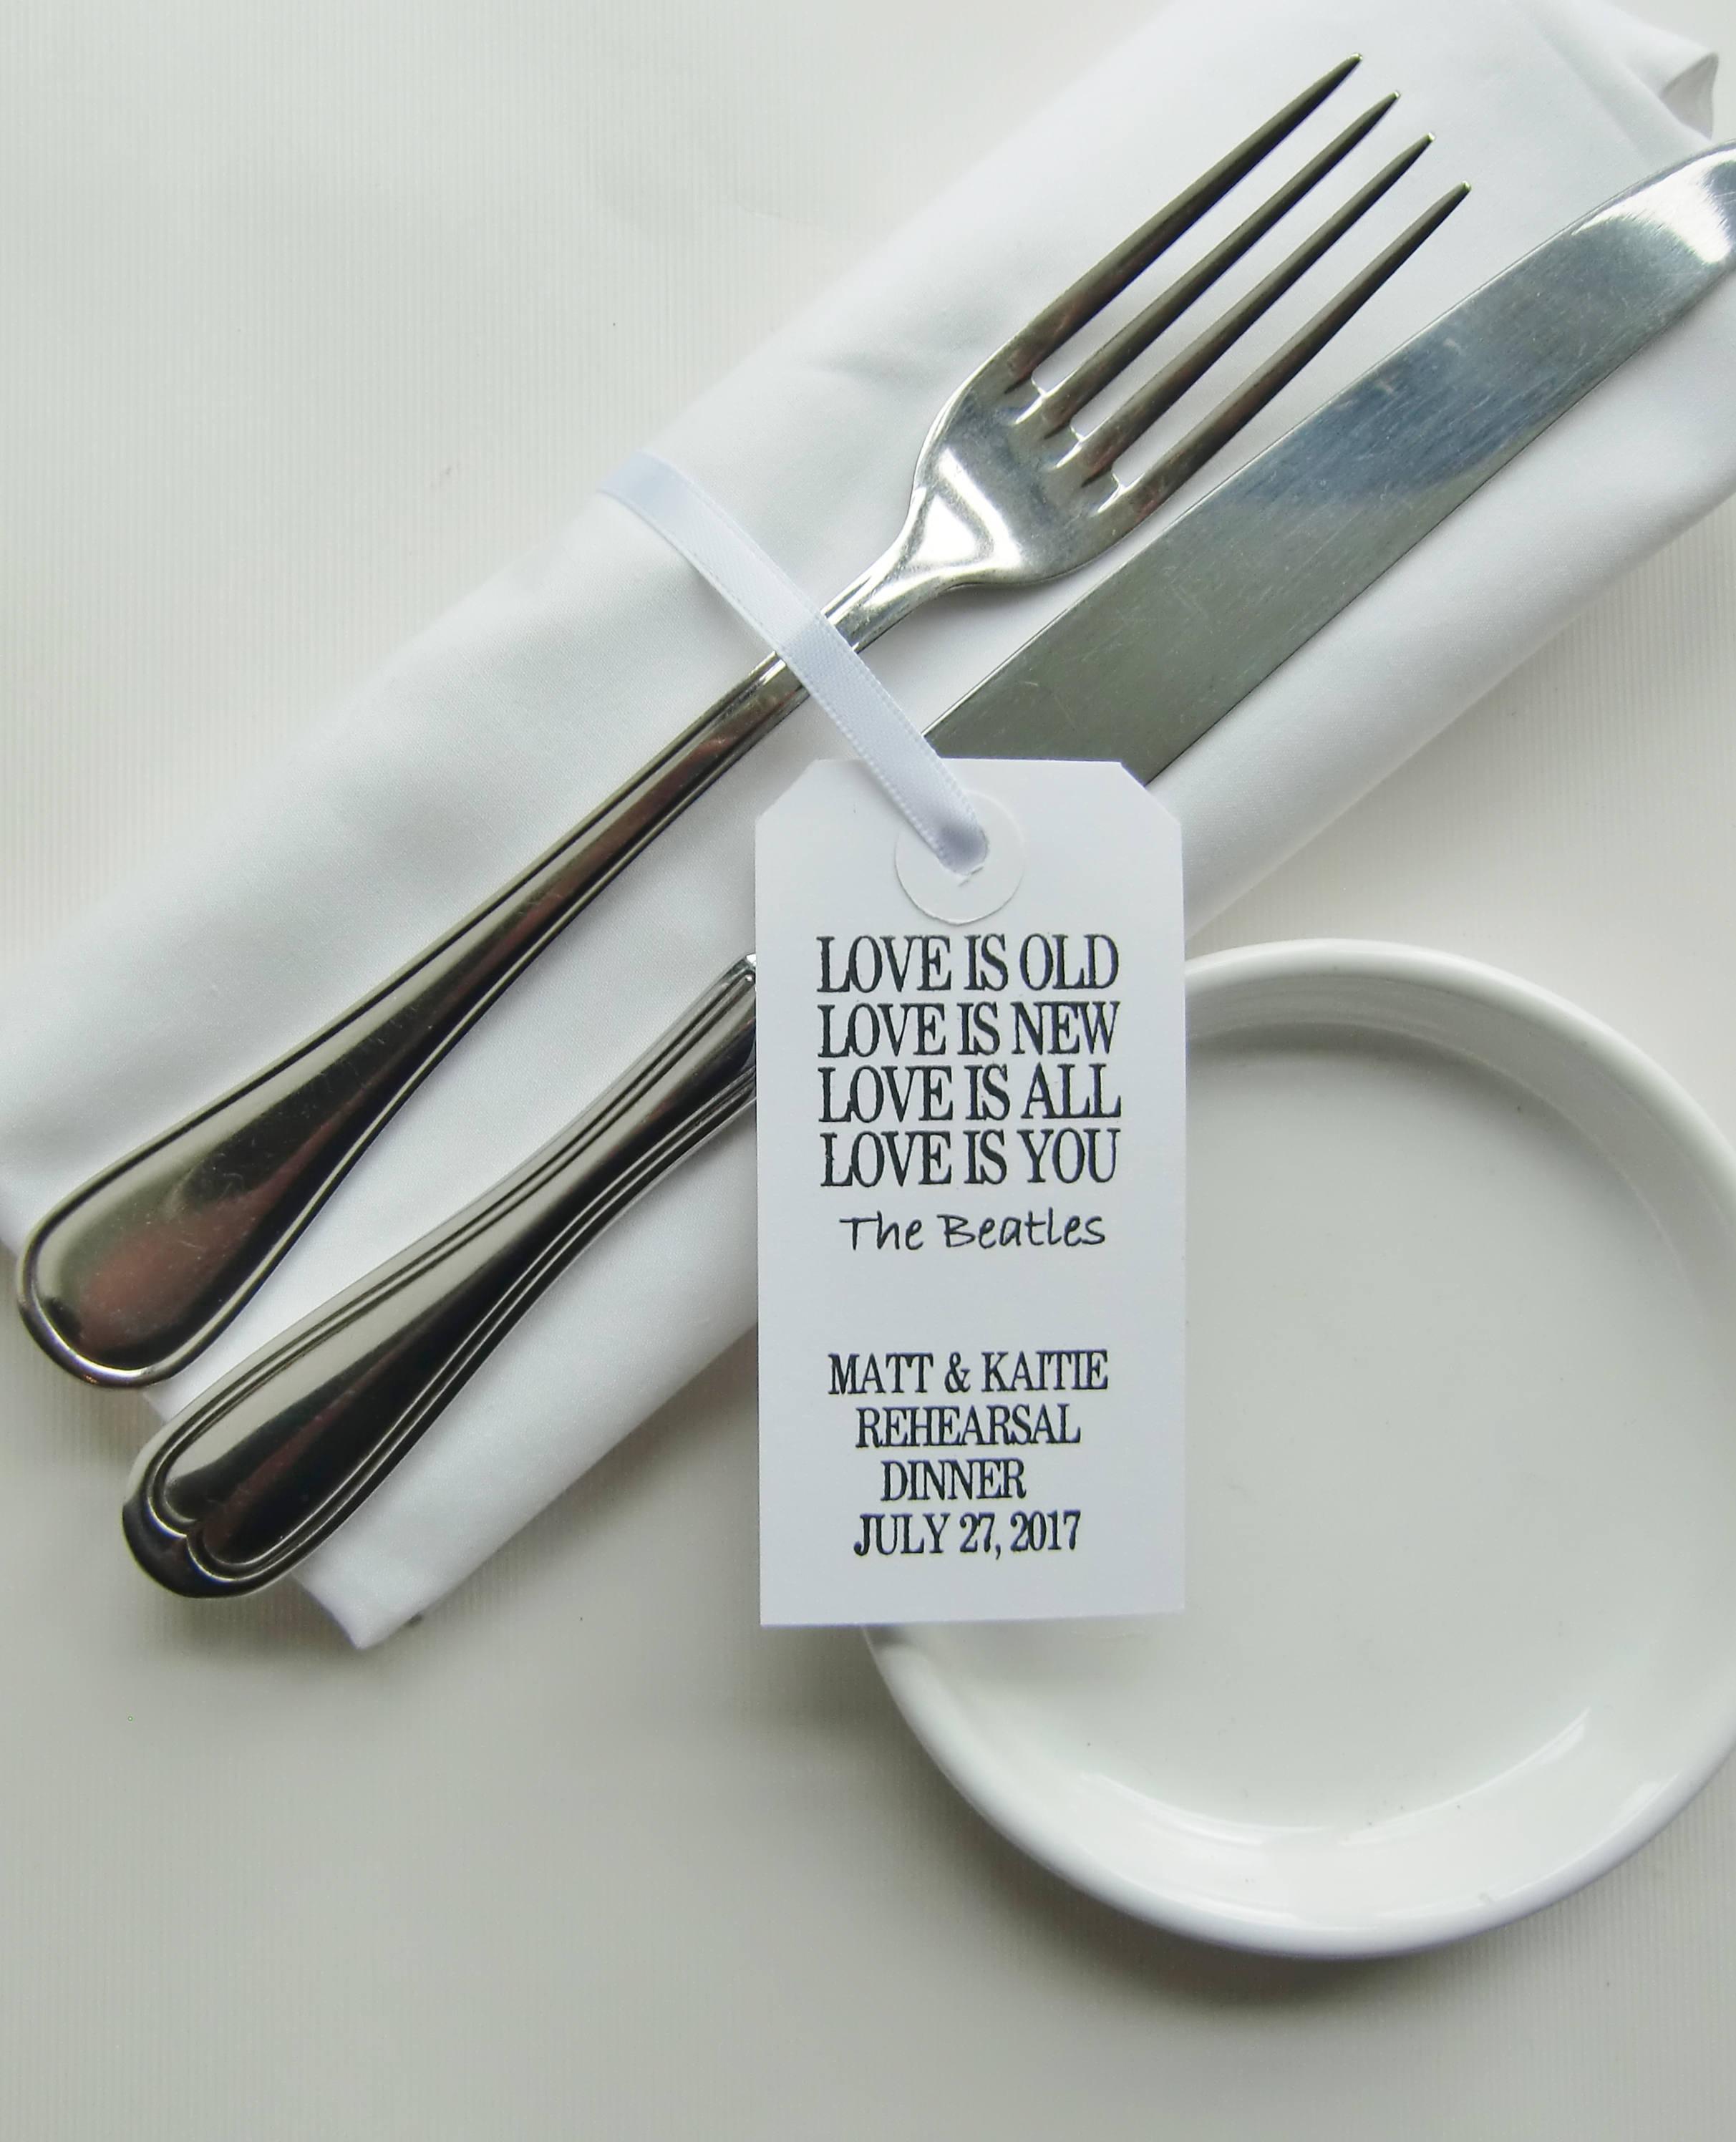 Rehearsal Dinner Table Rehearsal Napkin Ties BEATLES POEM Personalised  White Tags Wedding